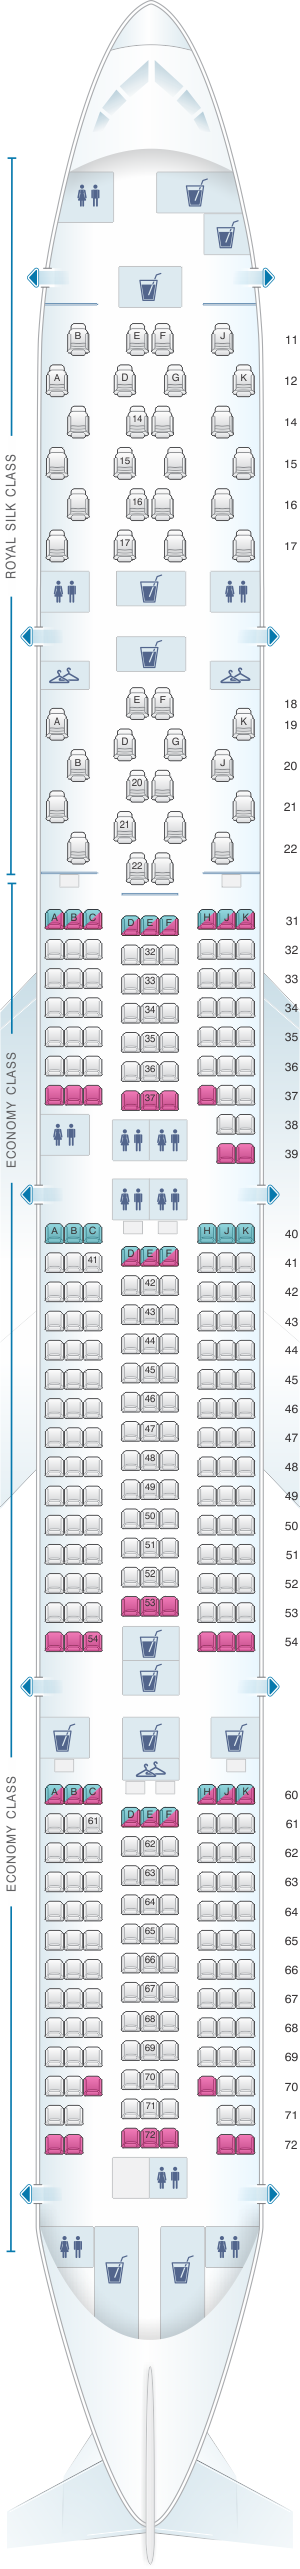 Seat map for Thai Airways International Boeing B777 300ER config 1